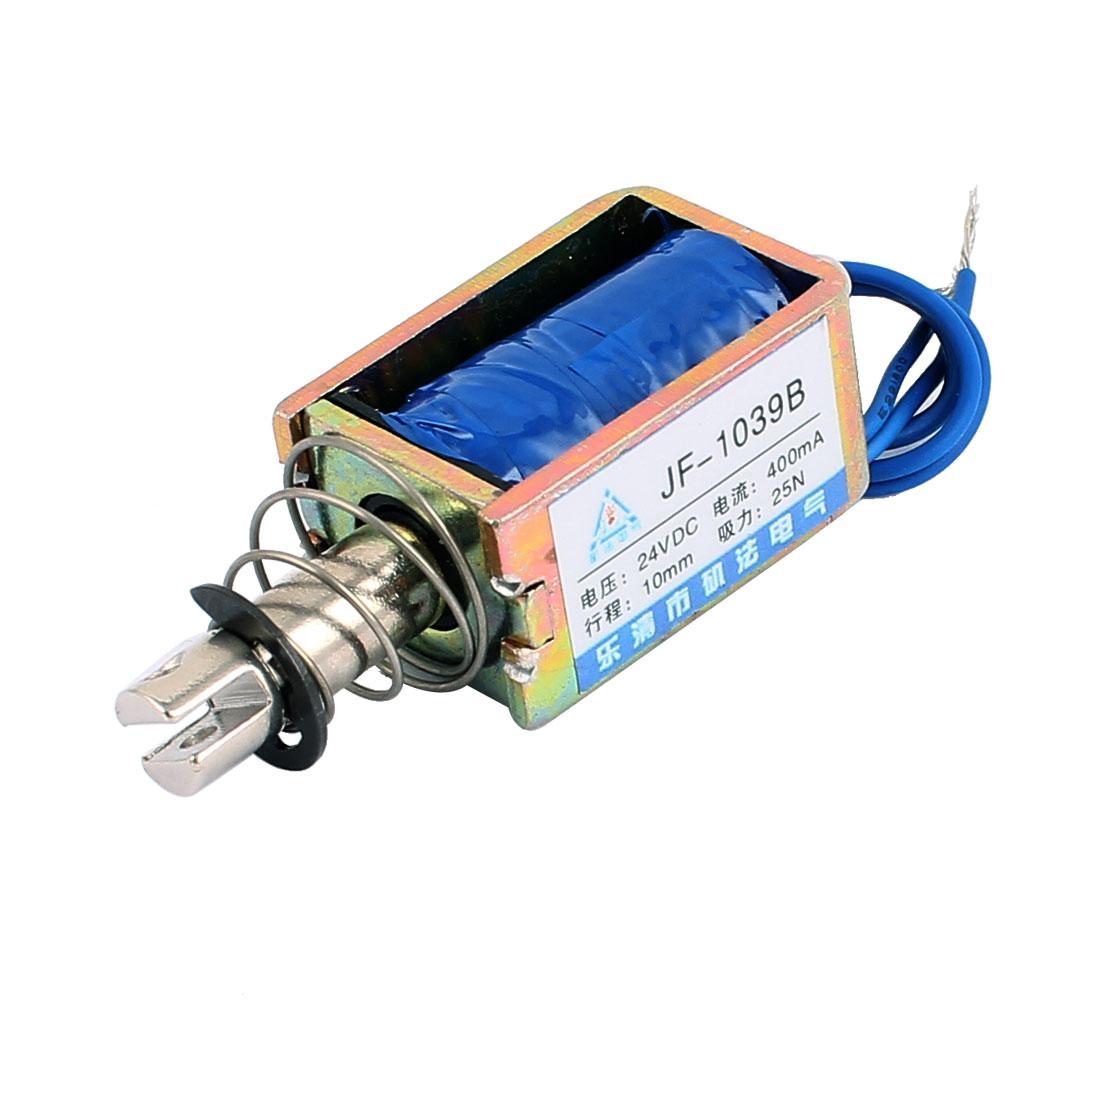 JF-1039B DC 24V 400mA 10mm 25N Push Pull Type DIY DC Solenoid Electromagnet Magnet